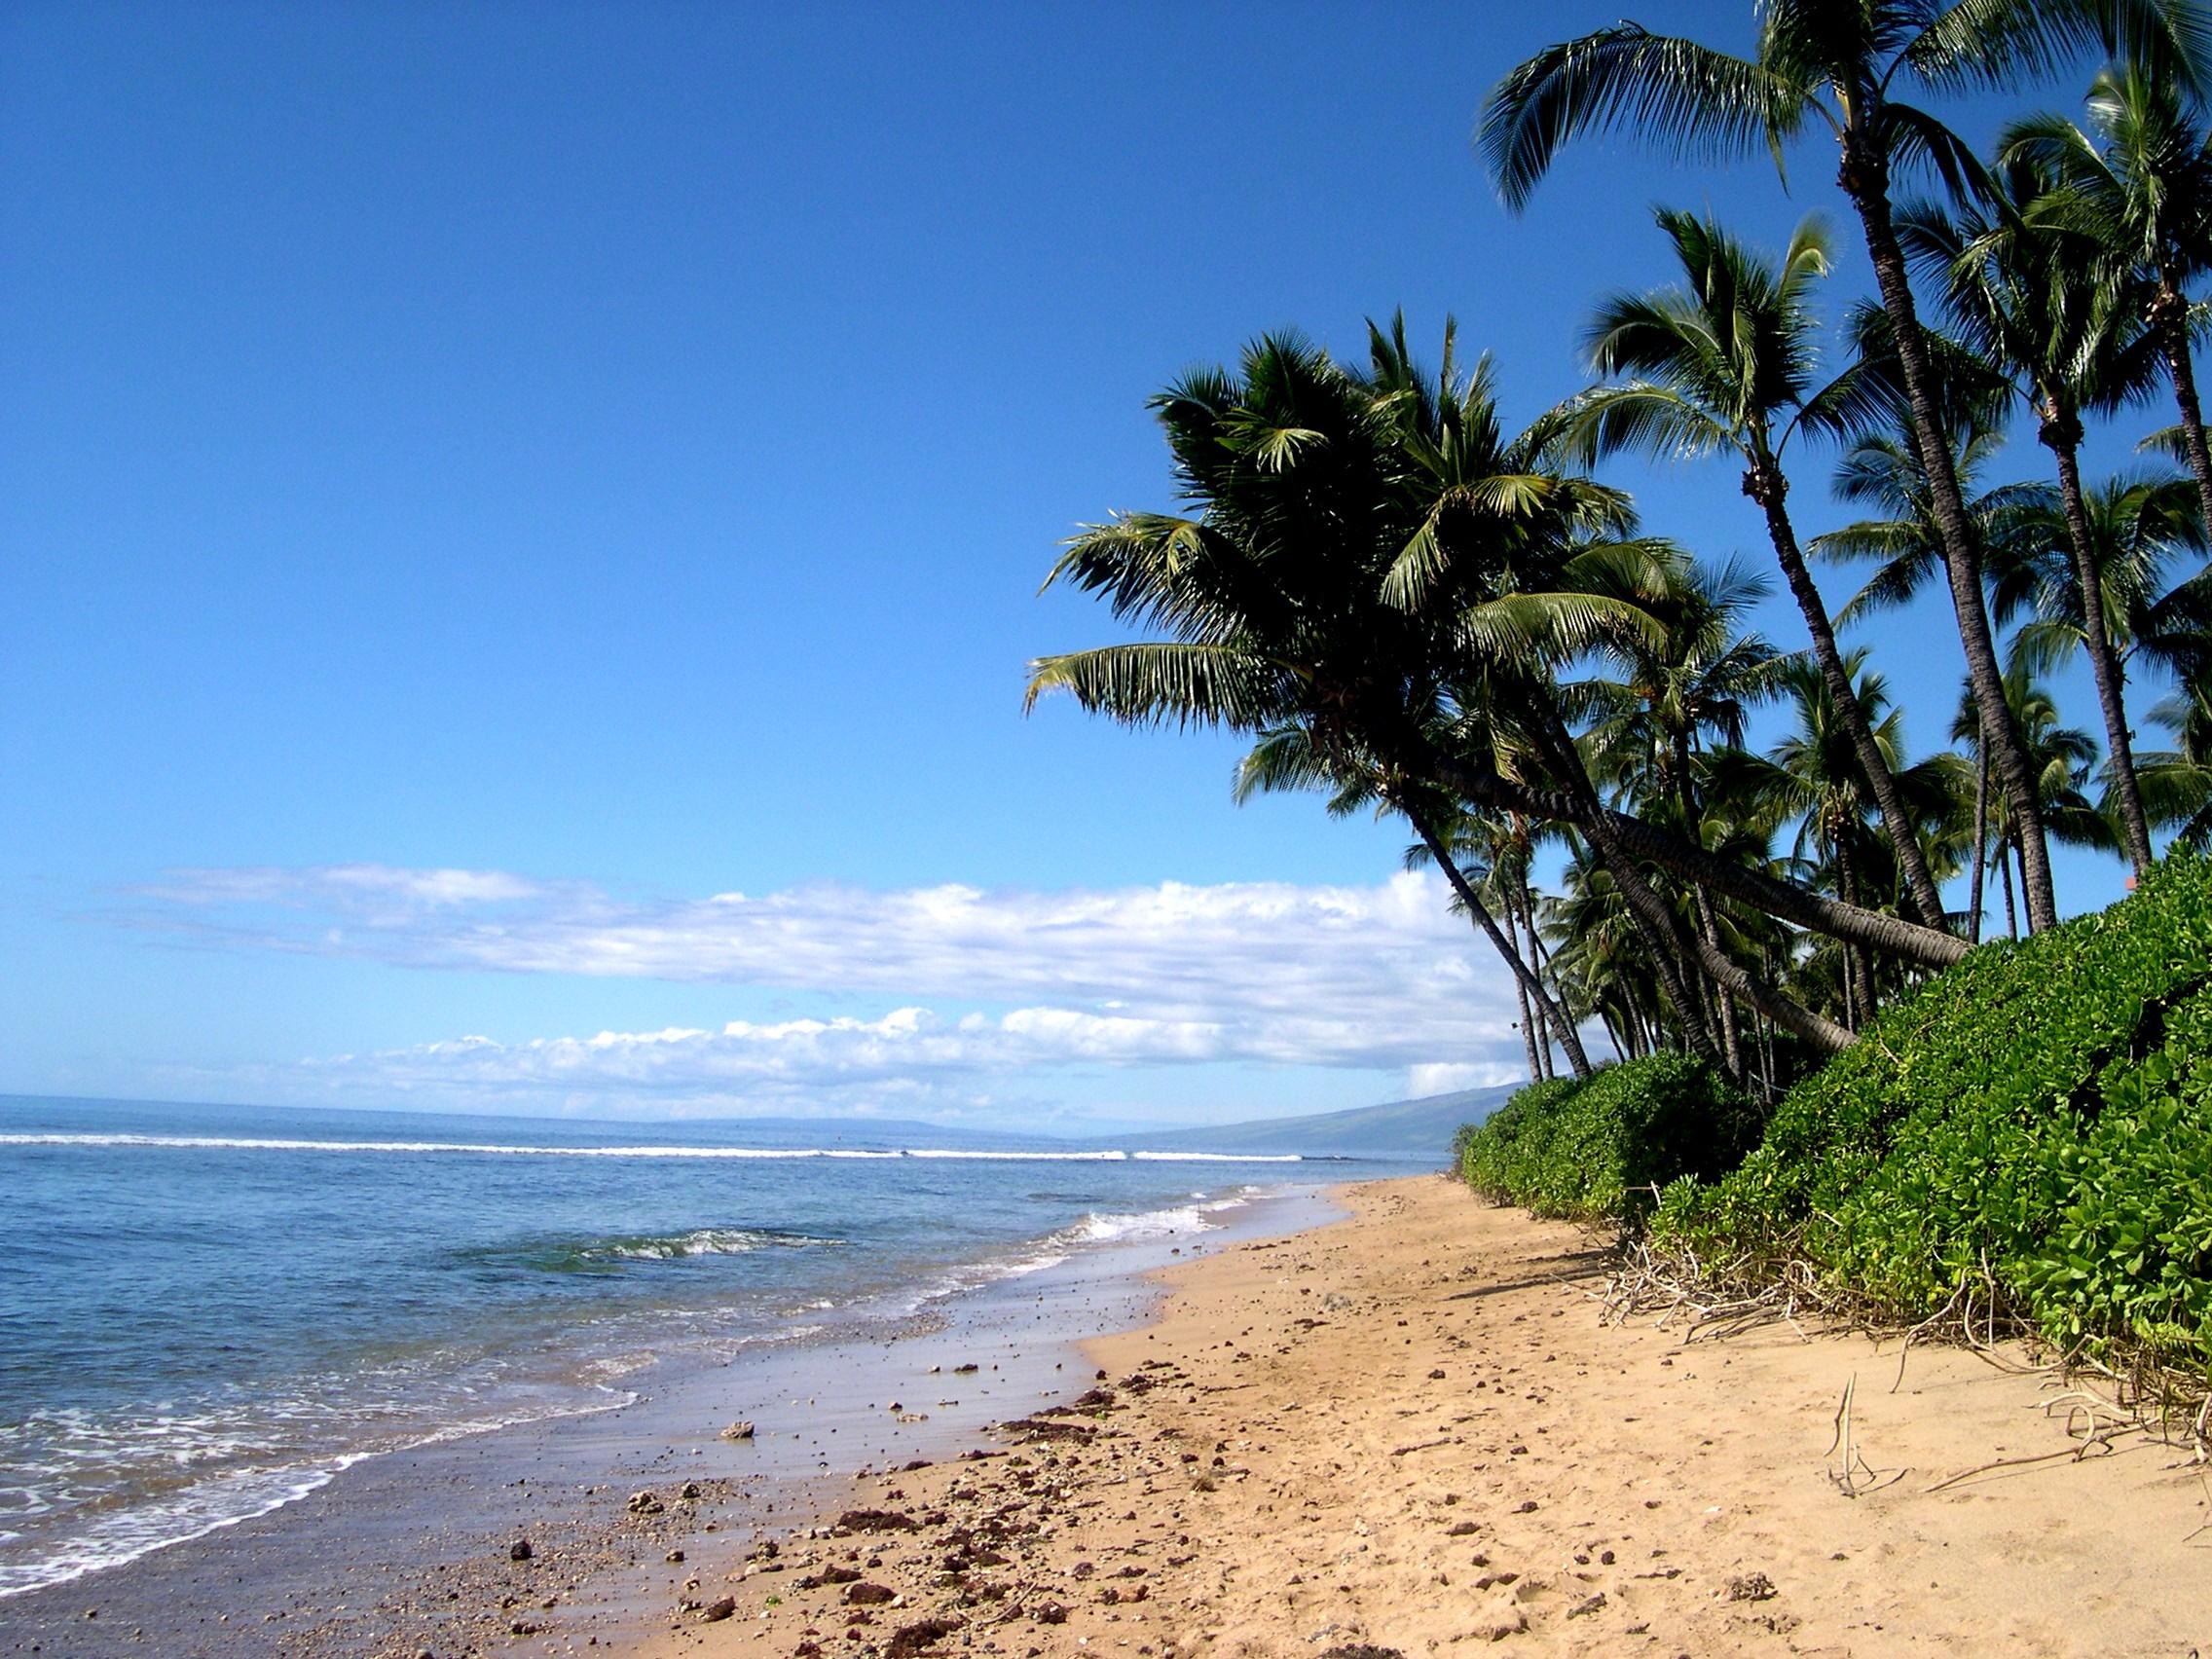 Maui  Hawaii Desktop and mobile wallpaper Wallippo 2272x1704